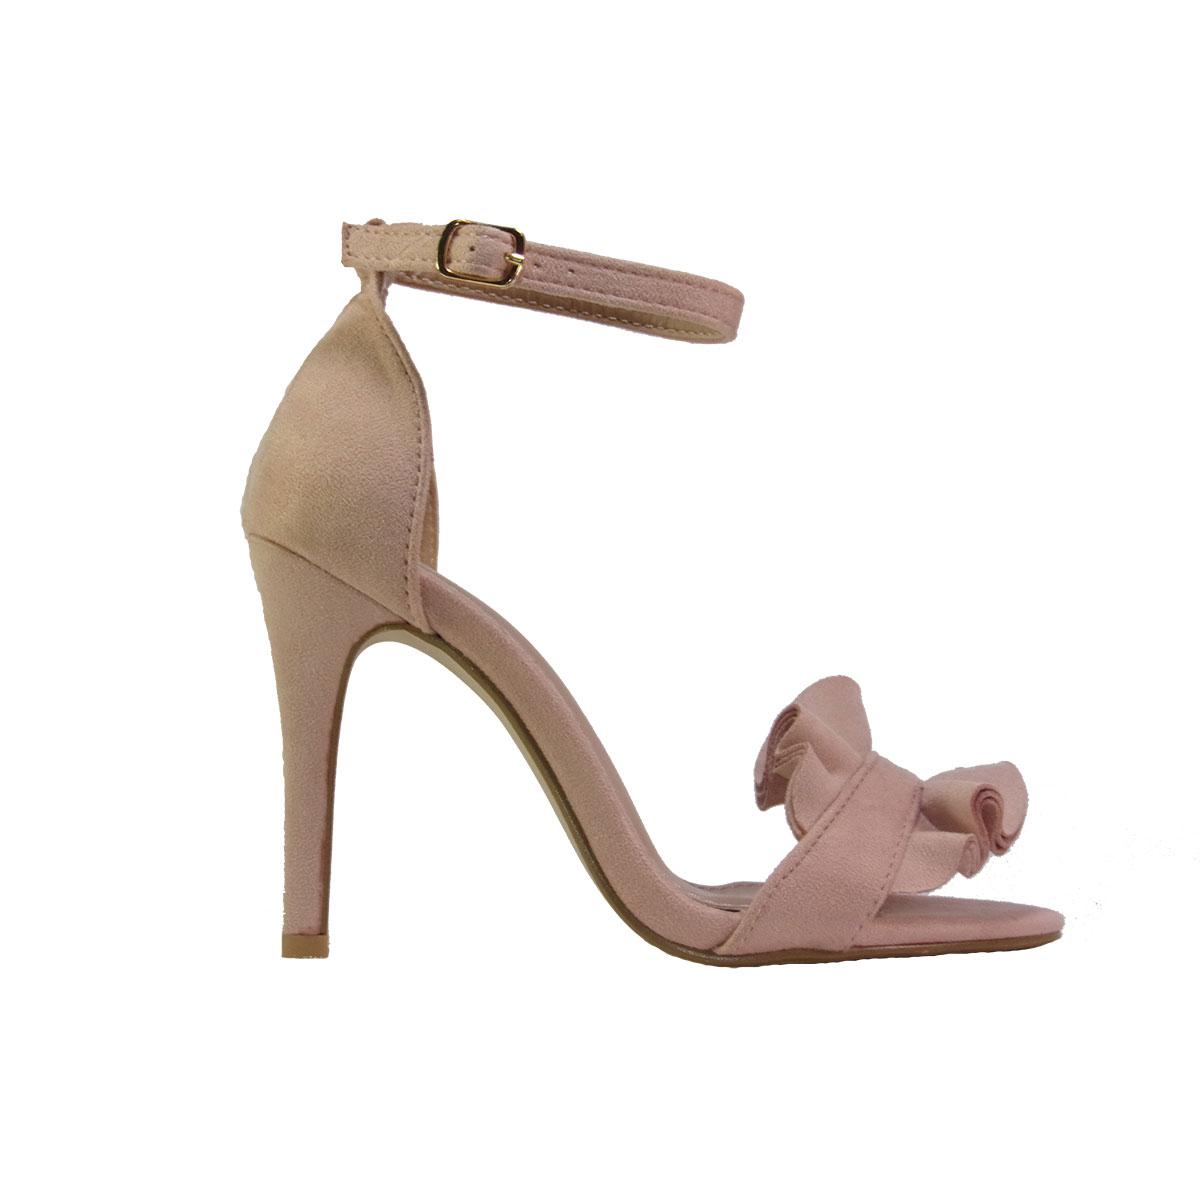 fb03a5ac40c8 ILoveMyShoes 005 Γυναικεία Πέδιλα Suede Ροζ – ILoveMyShoes